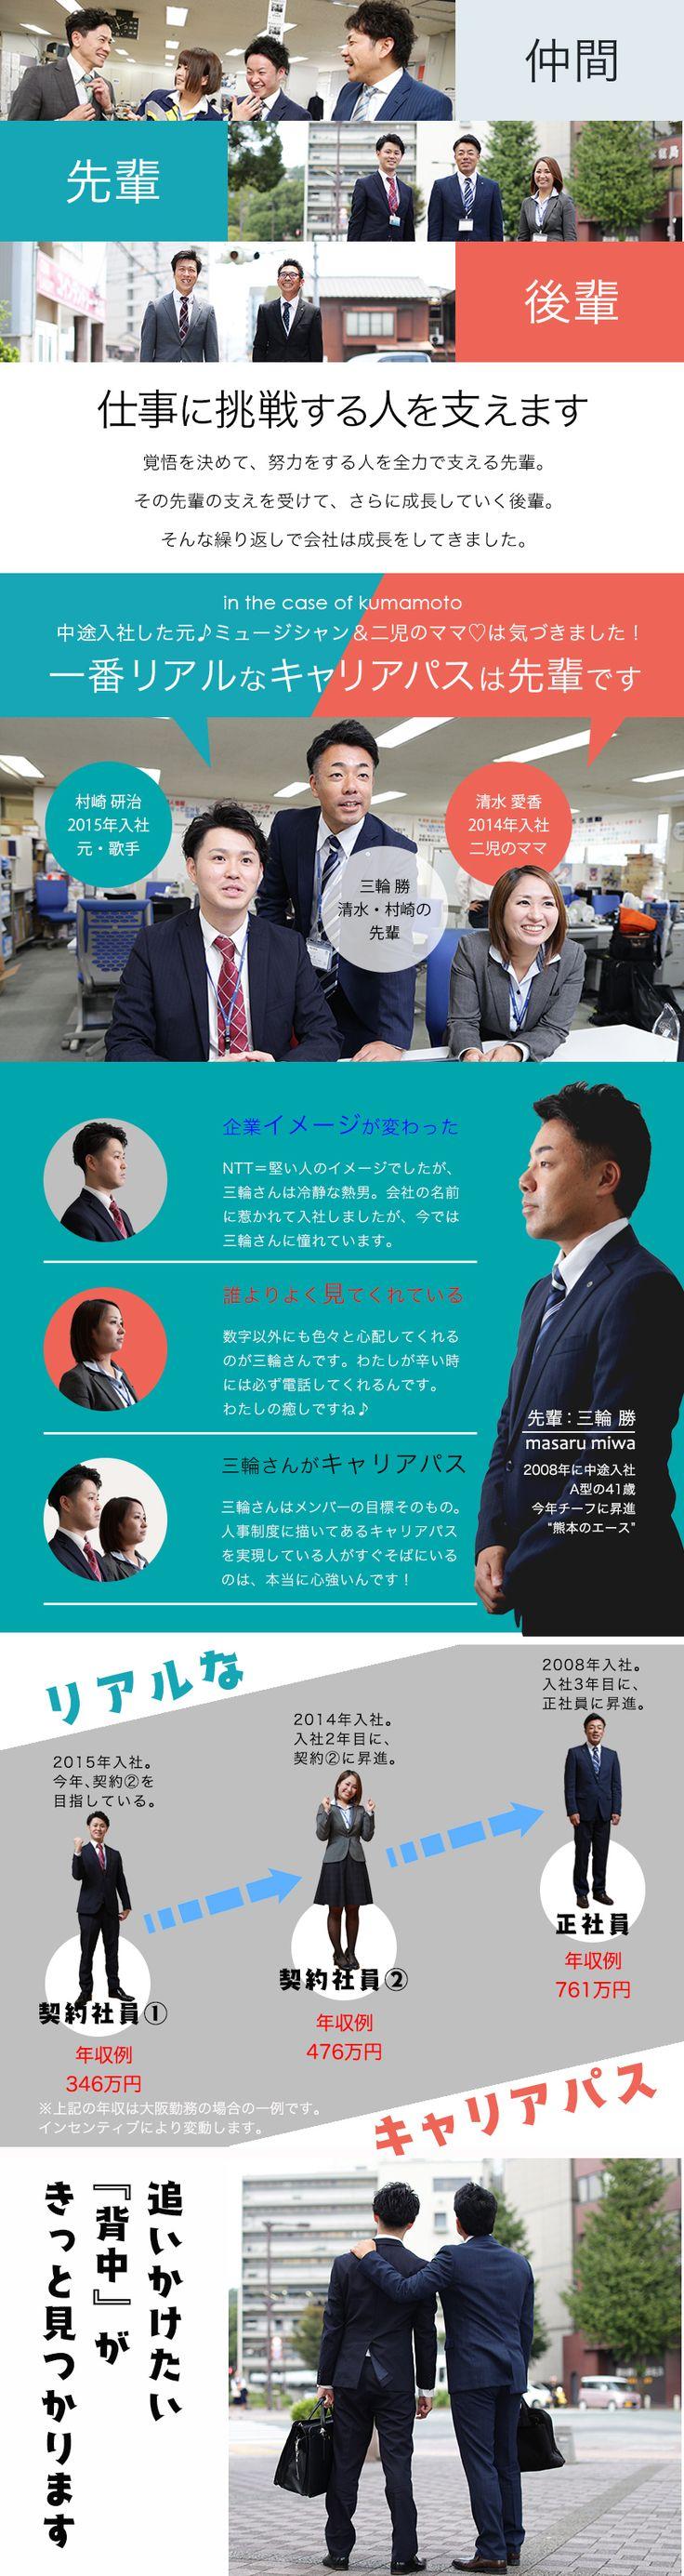 NTT西日本ビジネスフロント株式会社/法人営業/NTT西日本のICTサービス(光IP電話・フレッツ光など)の提案/未経験歓迎の求人PR - 転職ならDODA(デューダ)